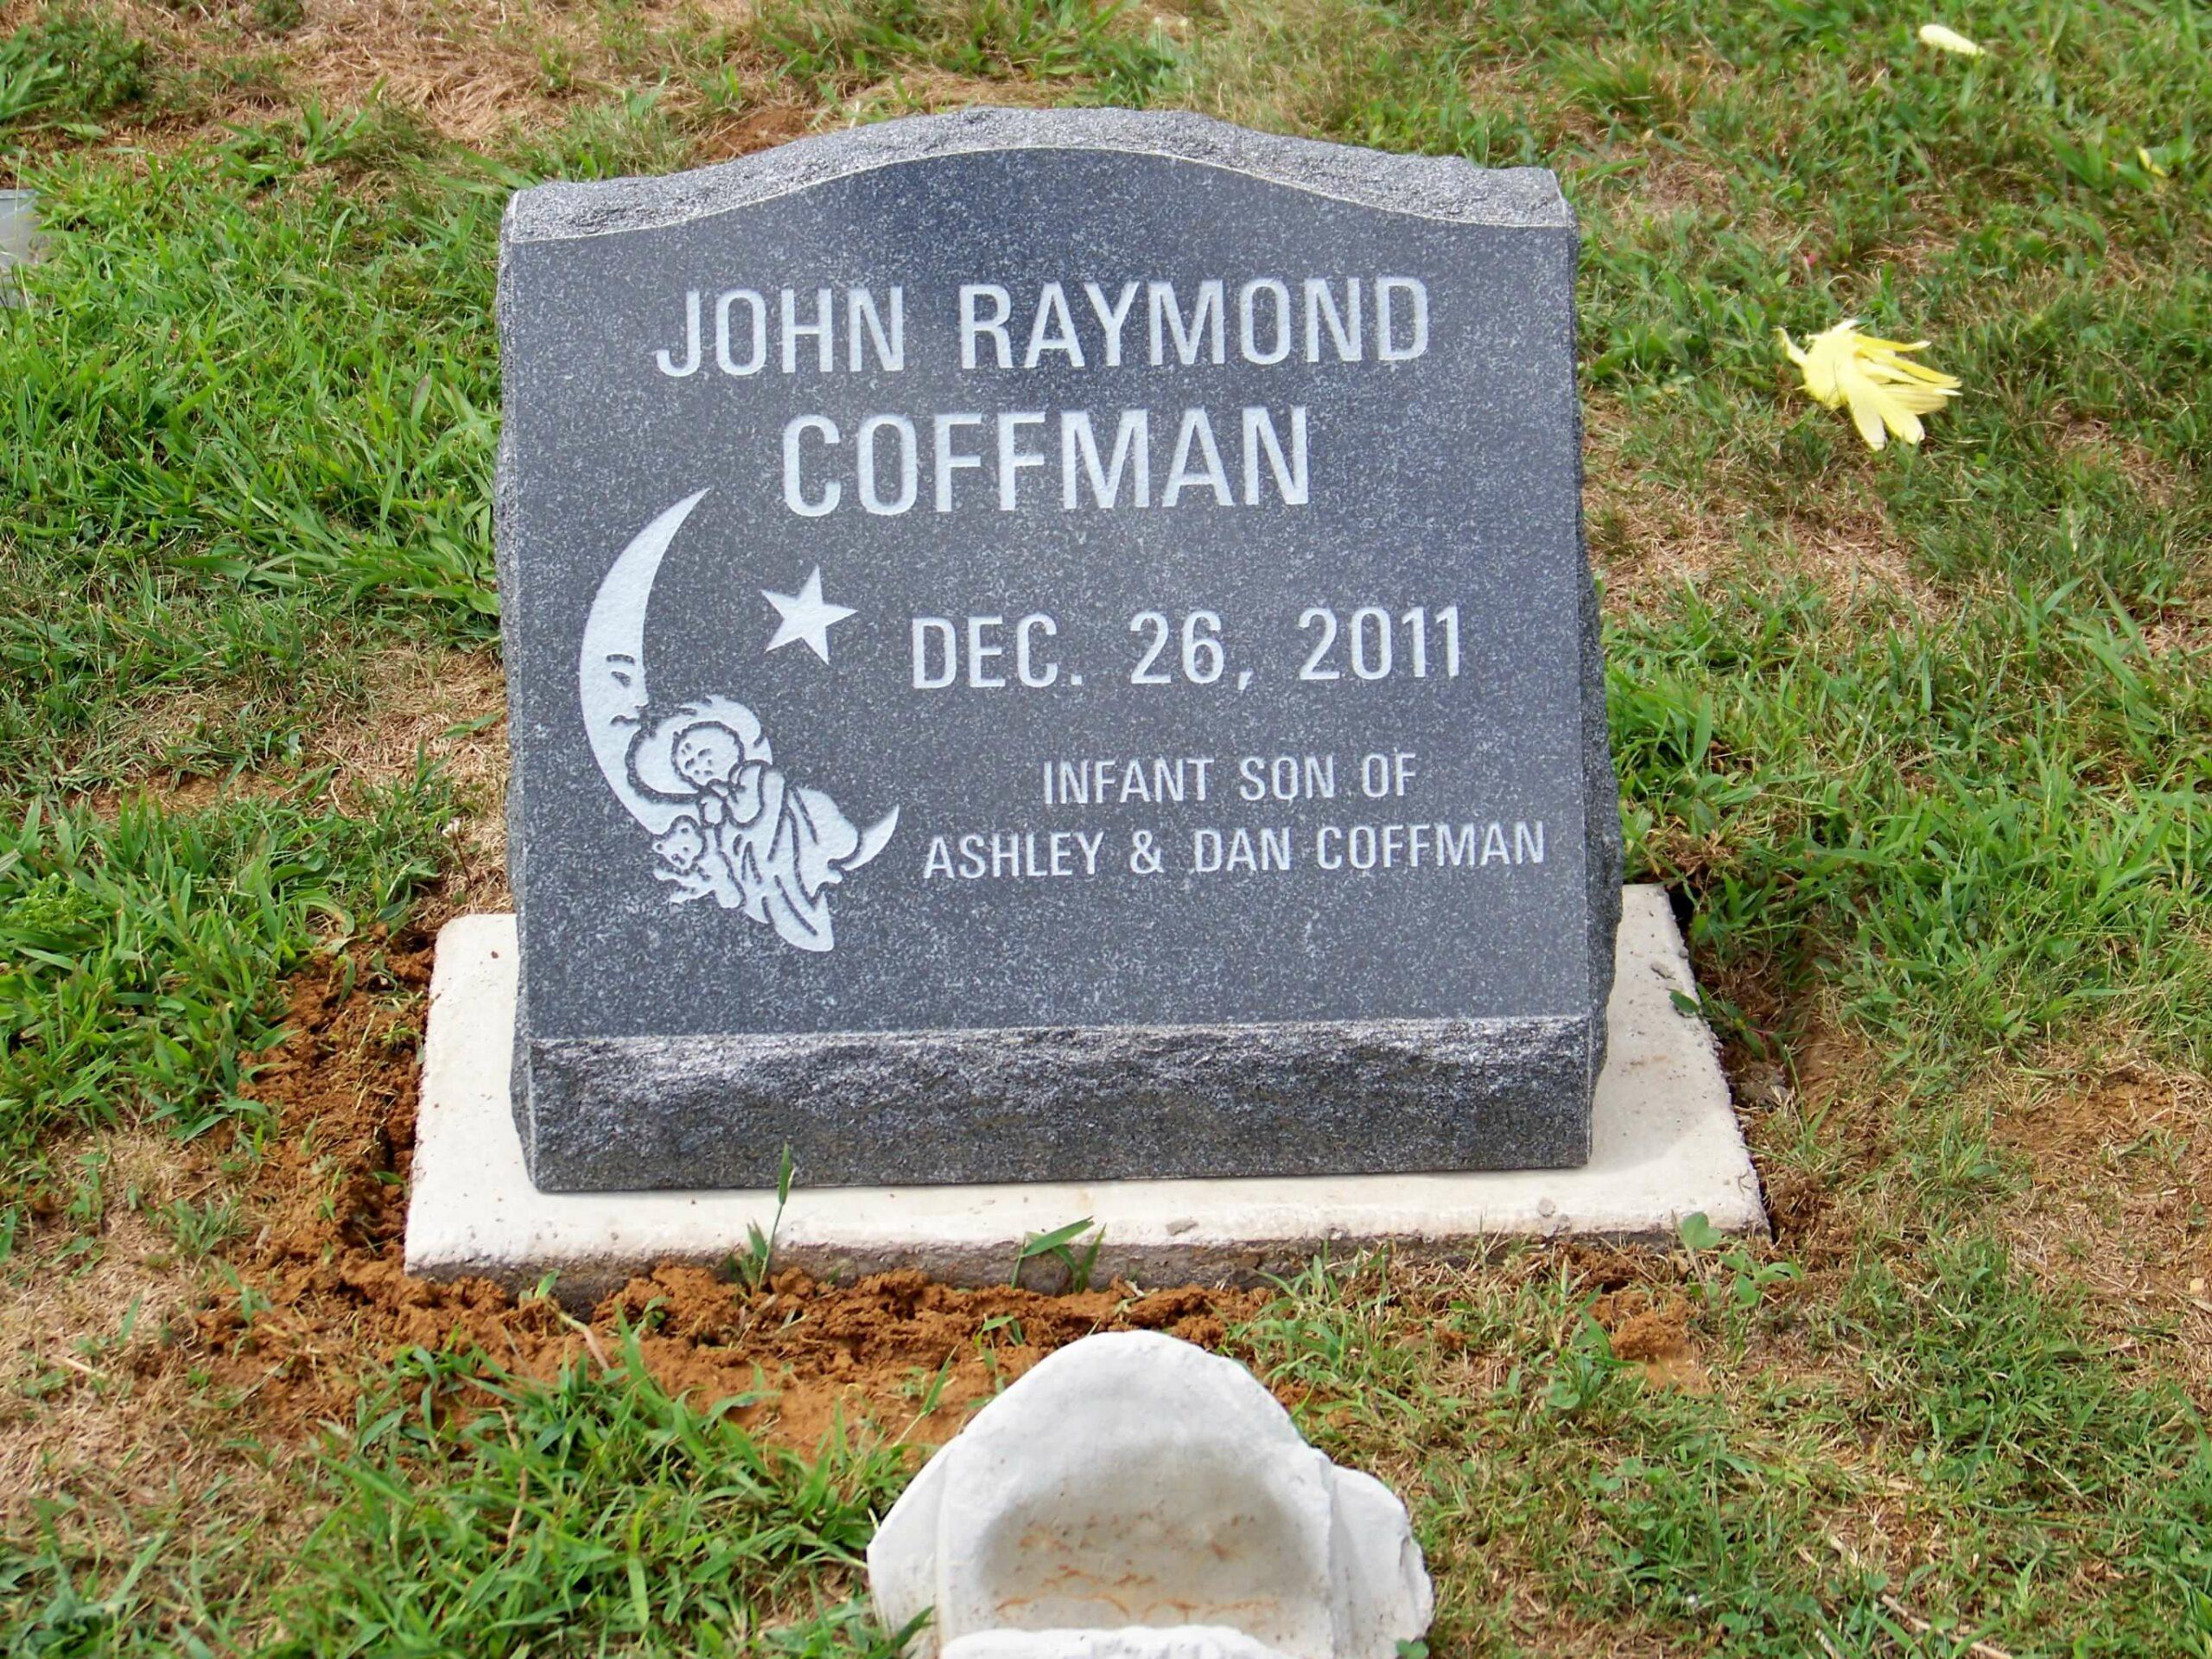 Coffman, John Raymond (1)